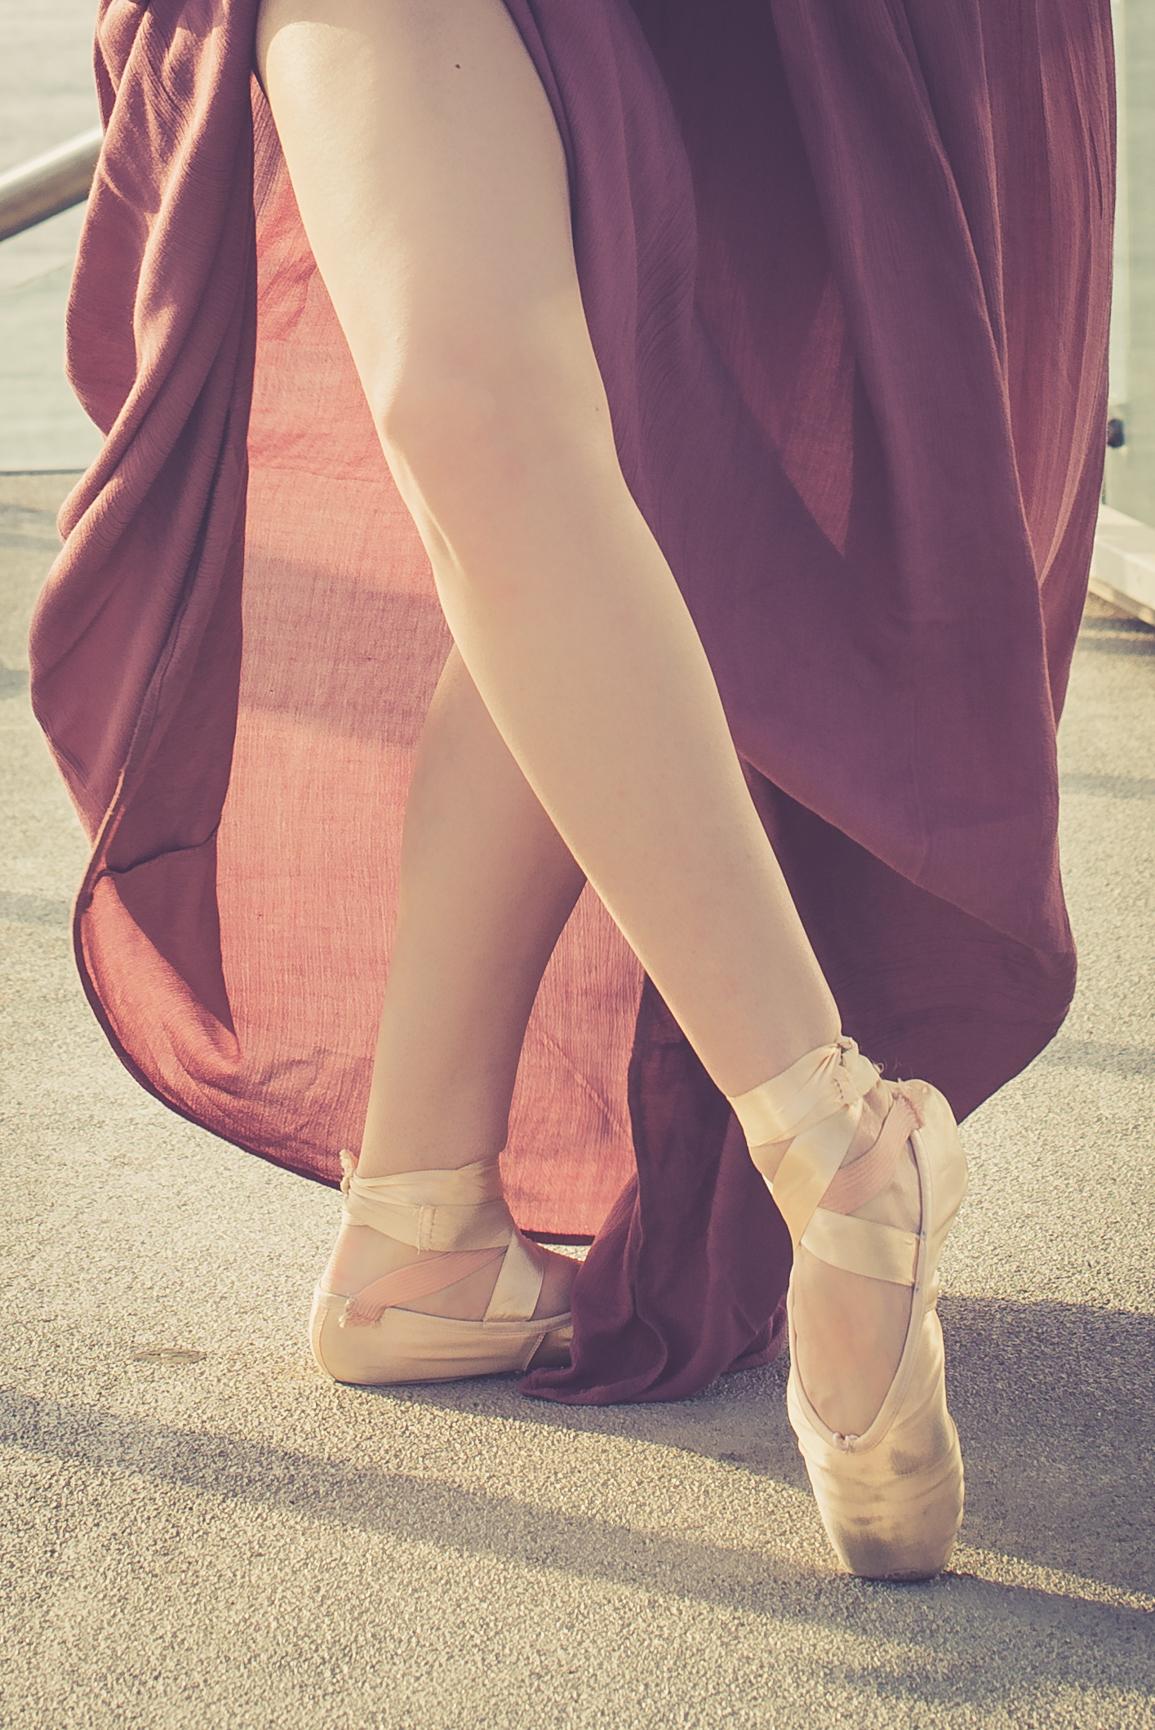 Caro_Ballerina-31.jpg